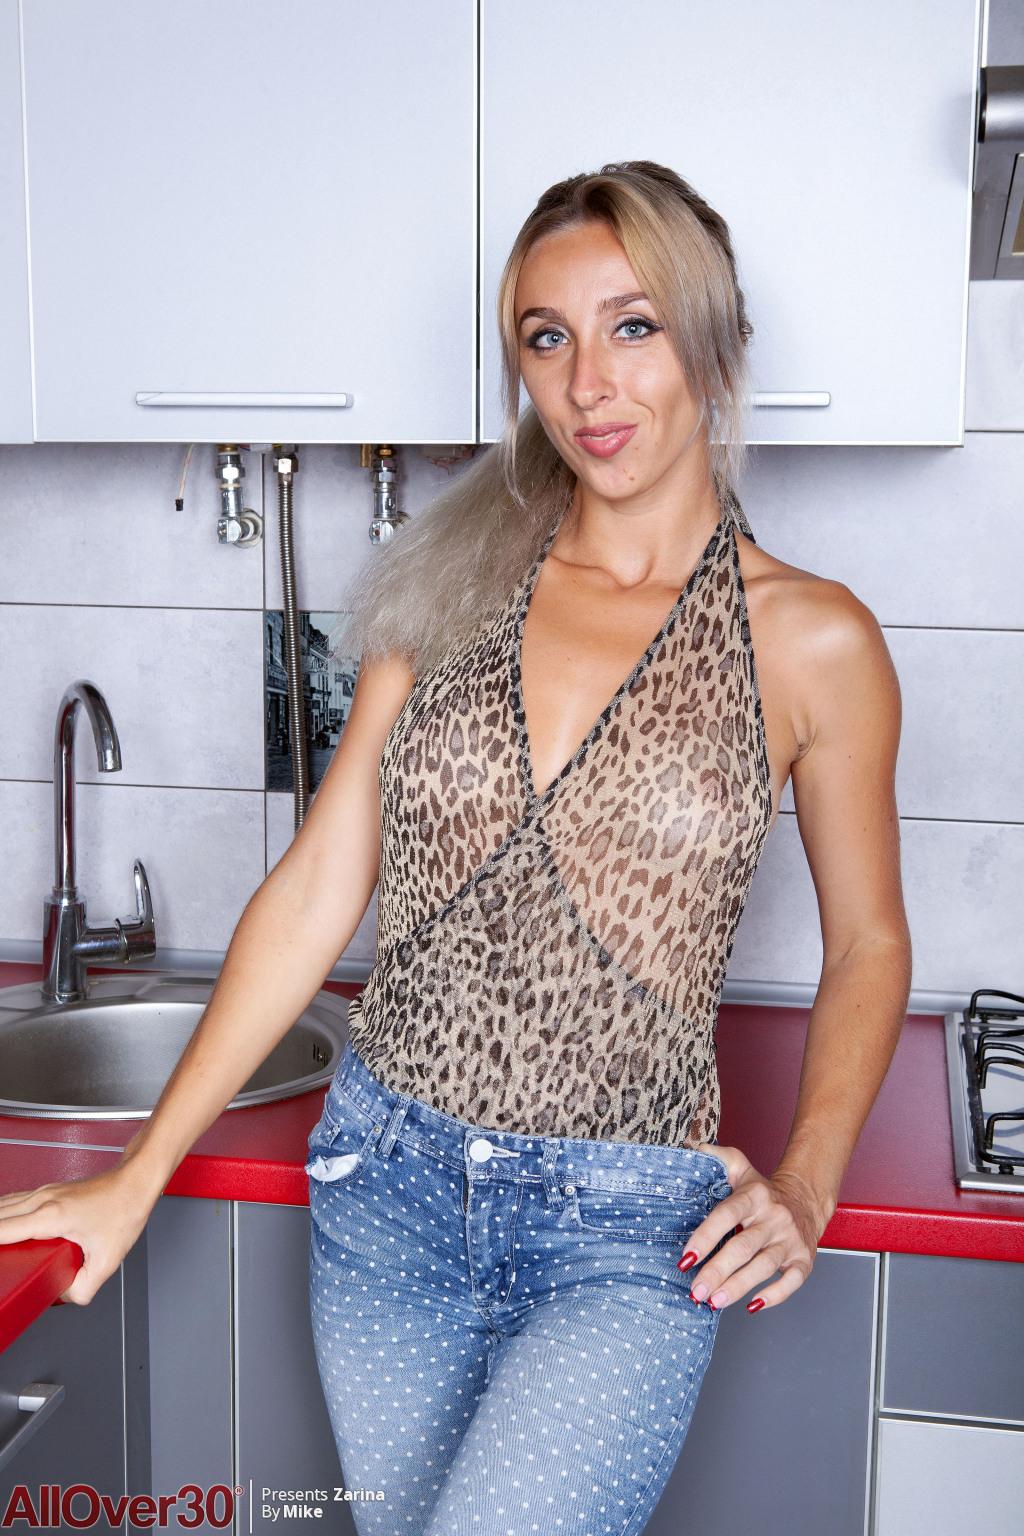 Zarina from AllOver30